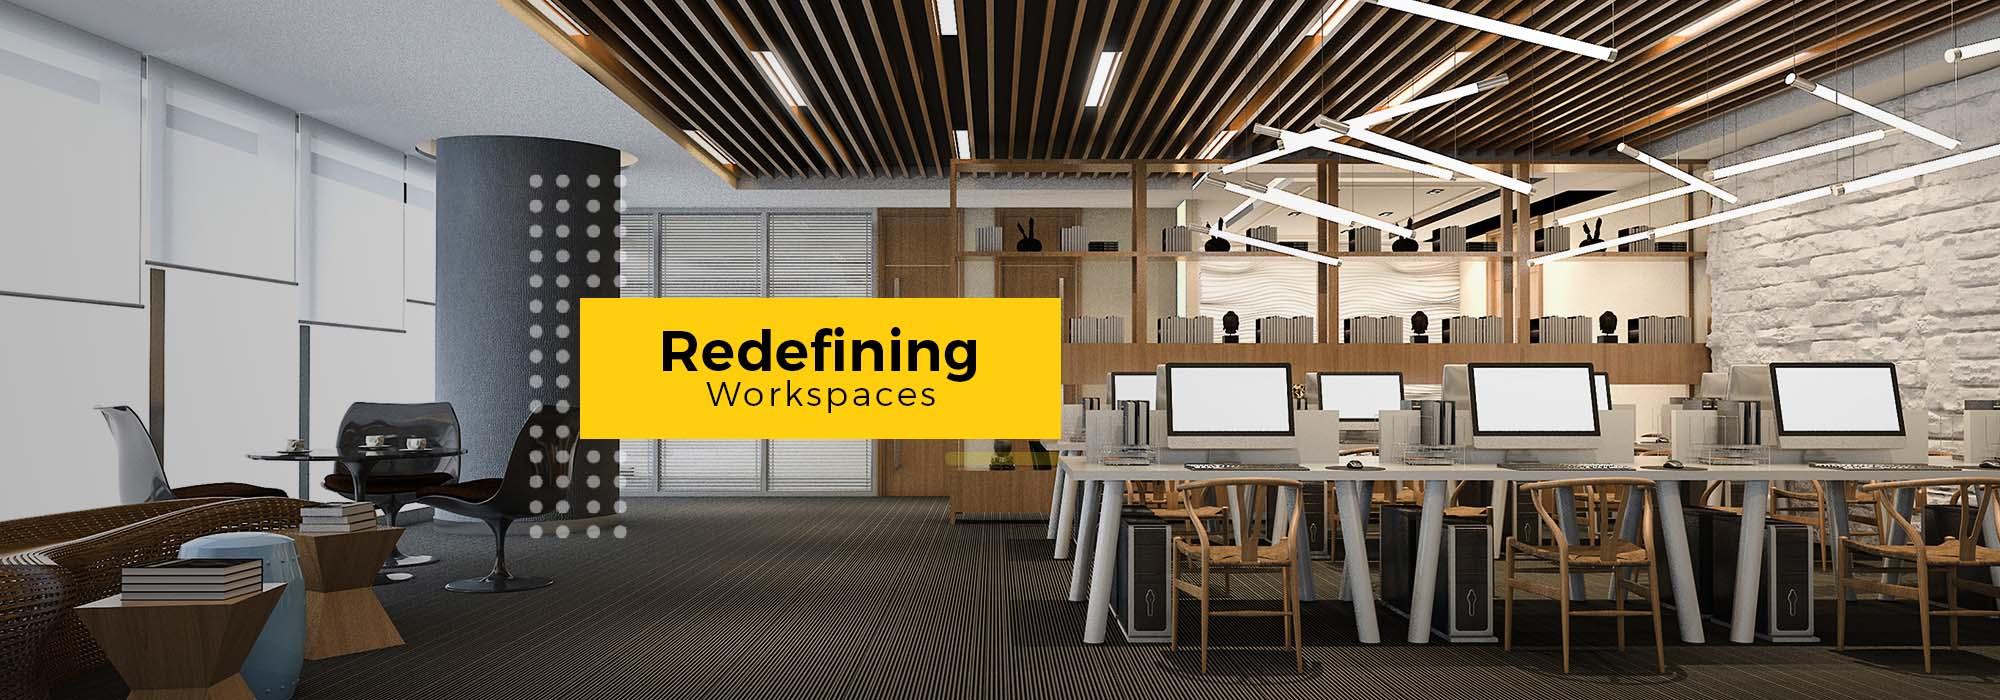 Redefining workspace